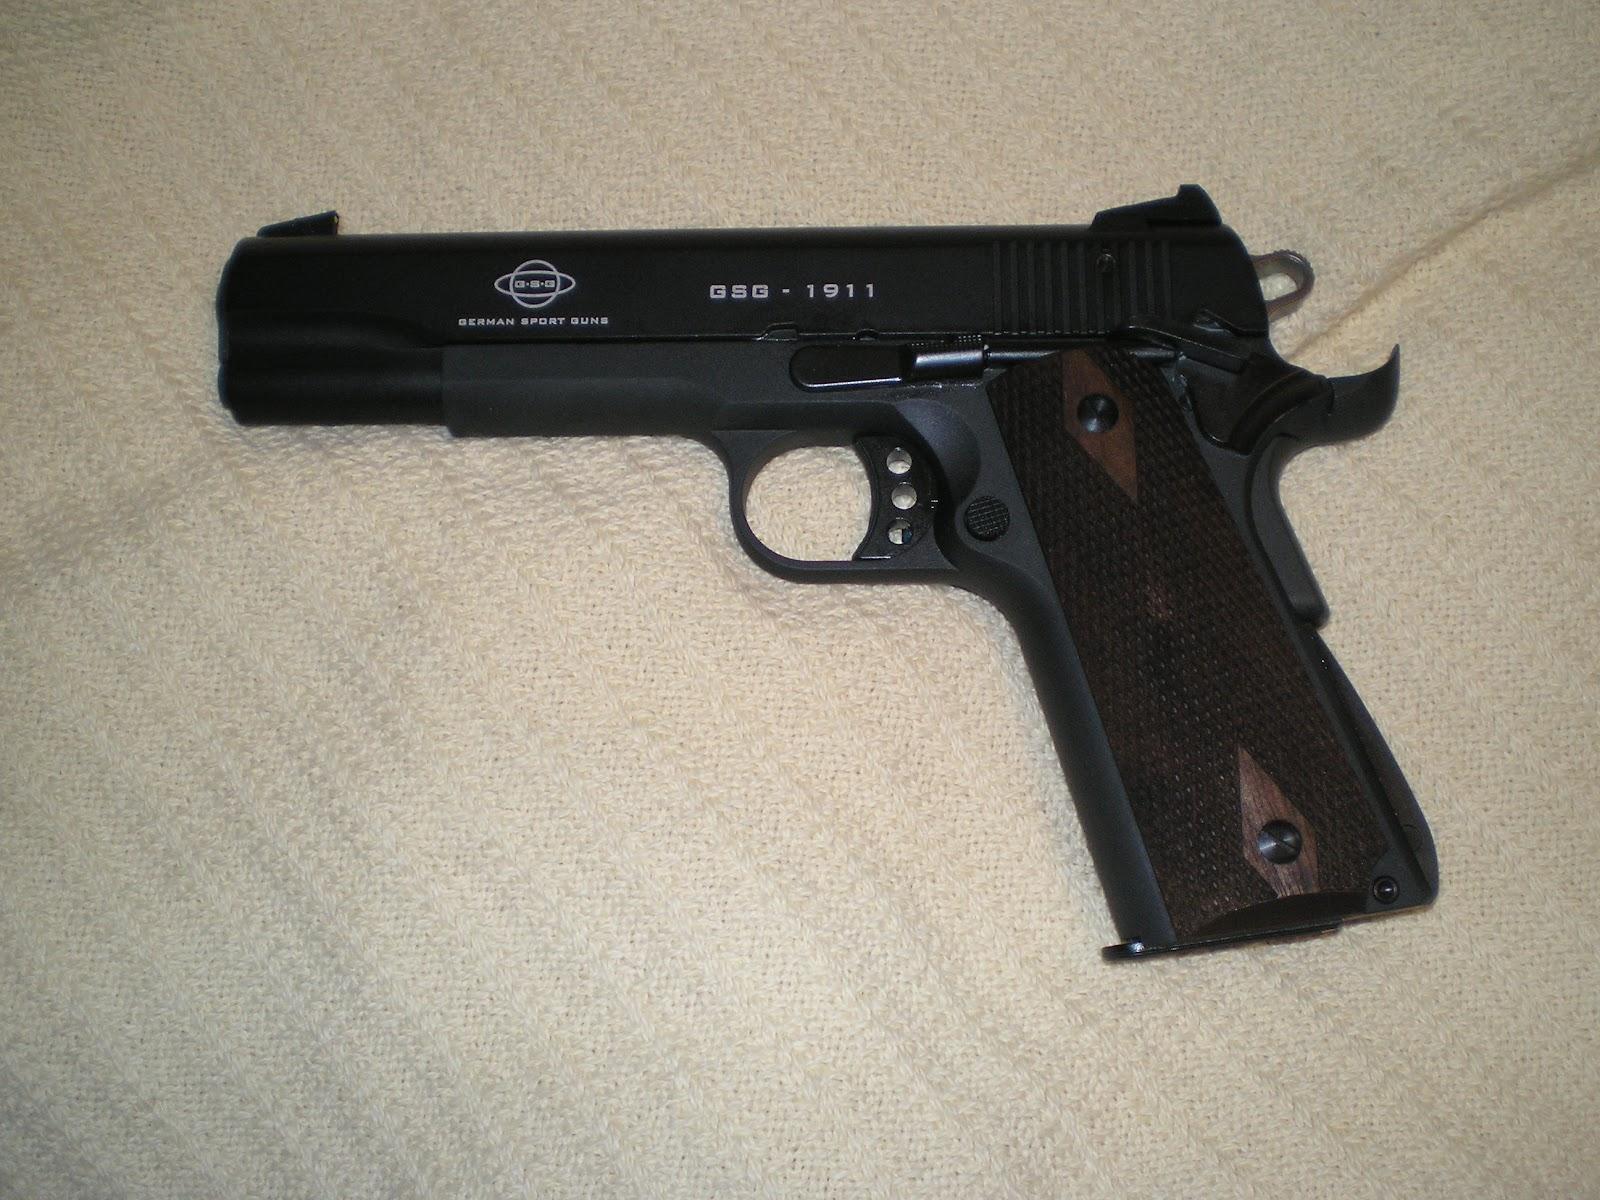 Witakers Gun Shop